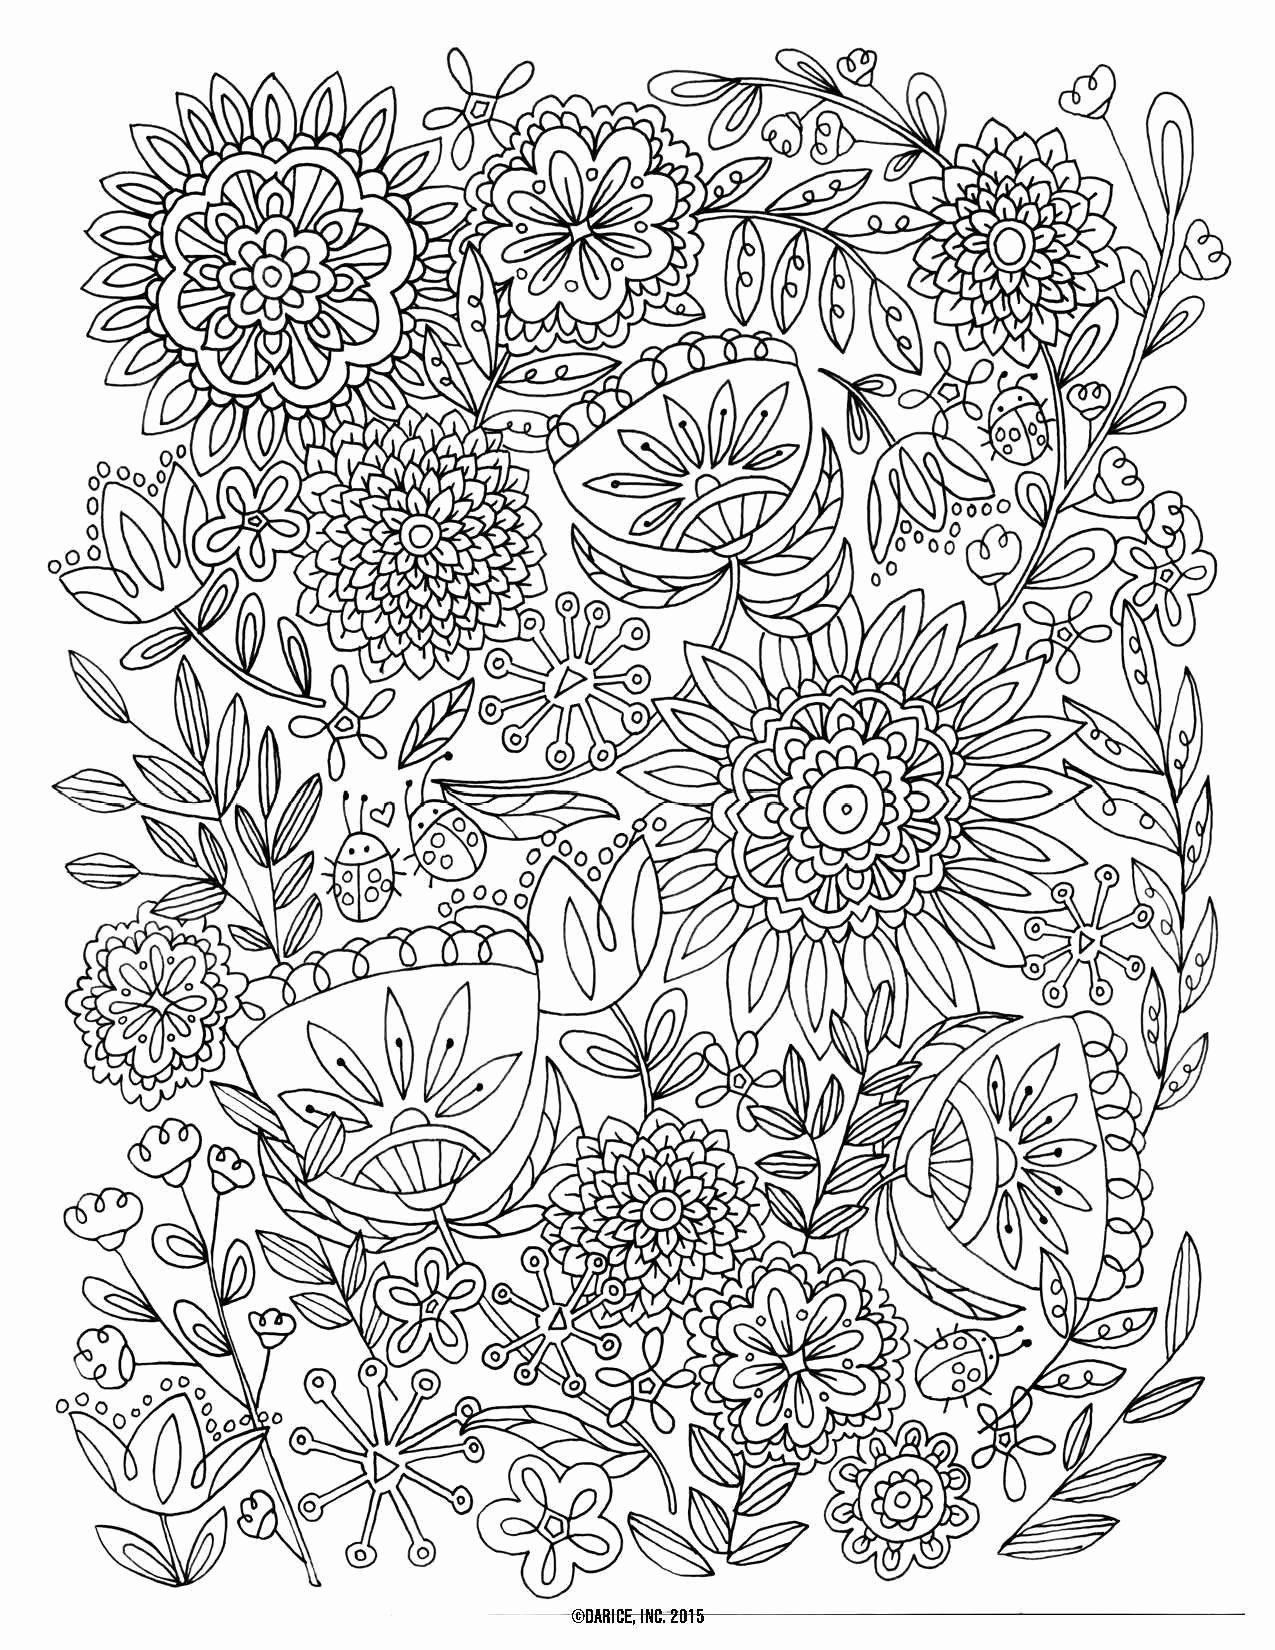 Halloween Coloring Pages Preschoolers New Printable Flower